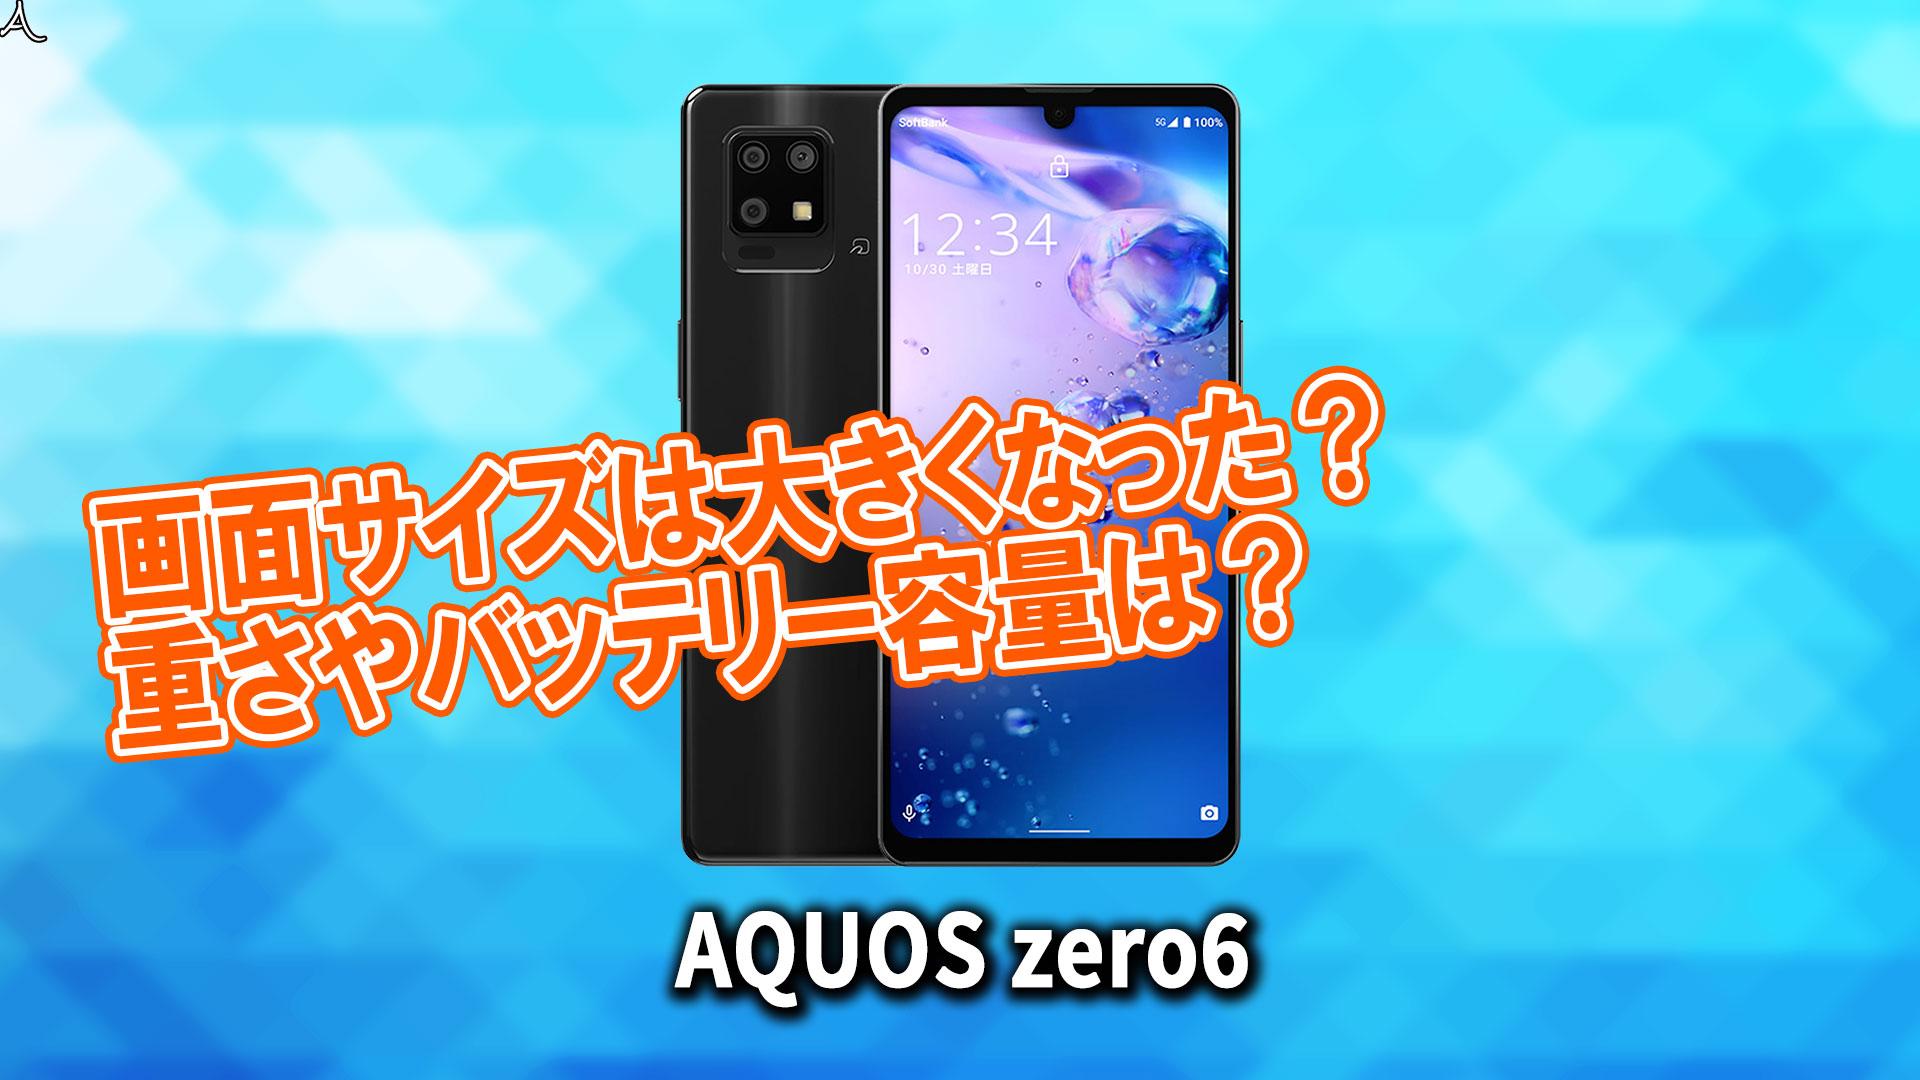 「AQUOS zero6」のサイズや重さを他のスマホと細かく比較